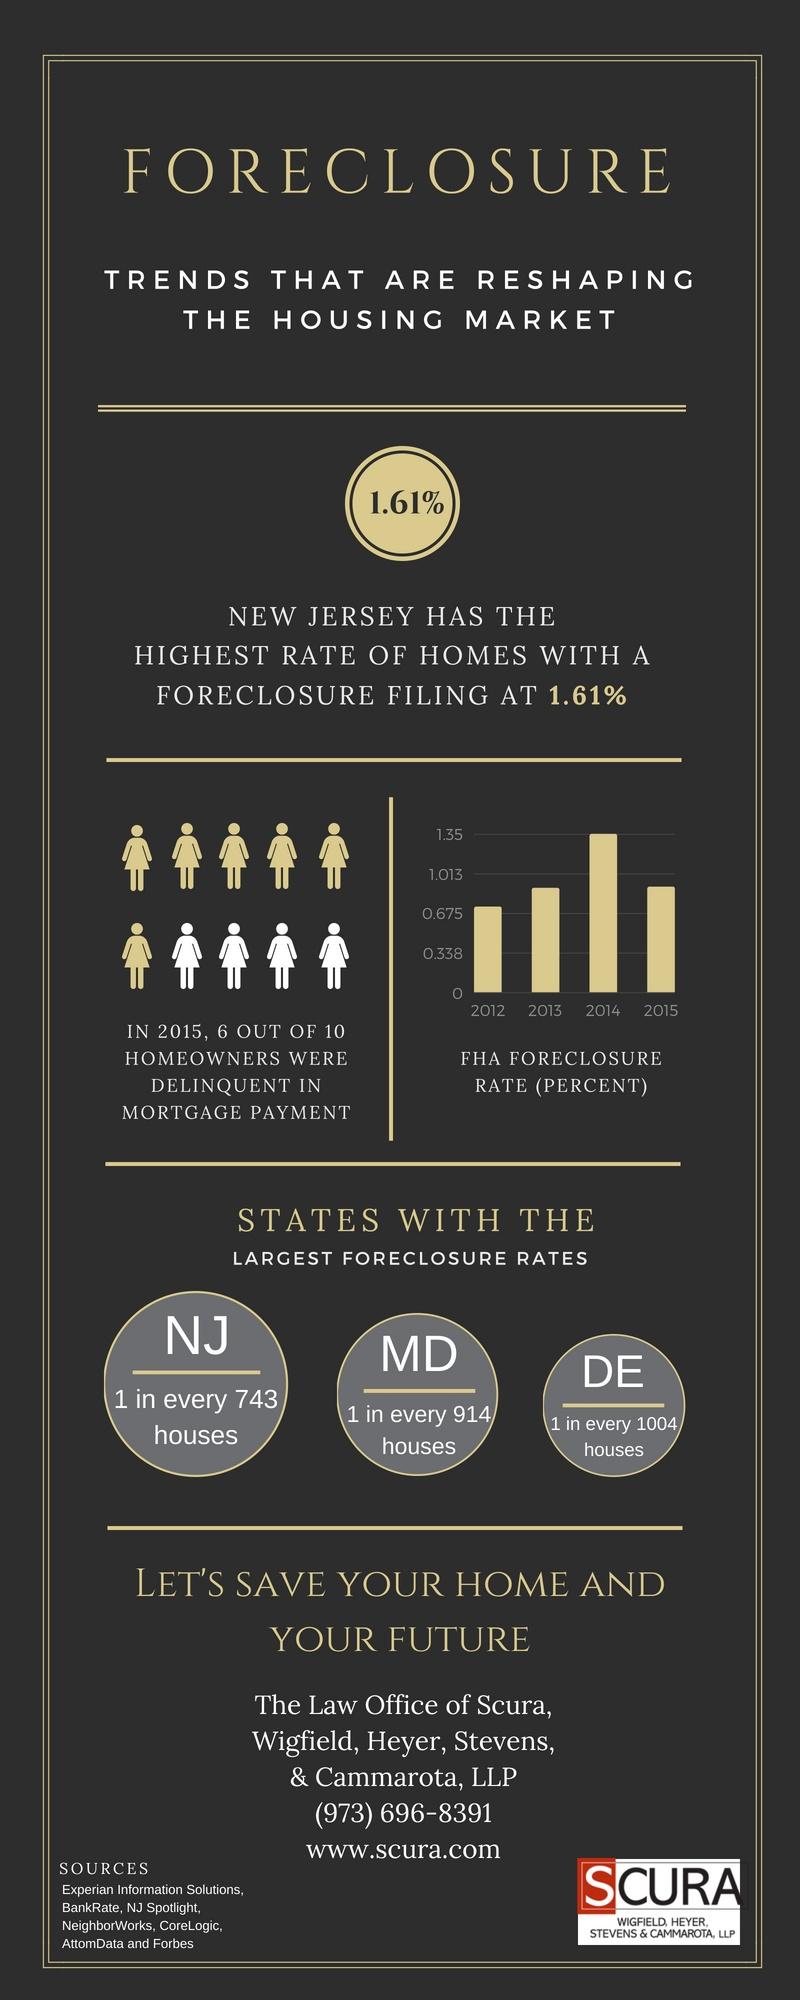 Foreclosure Infographic (2)